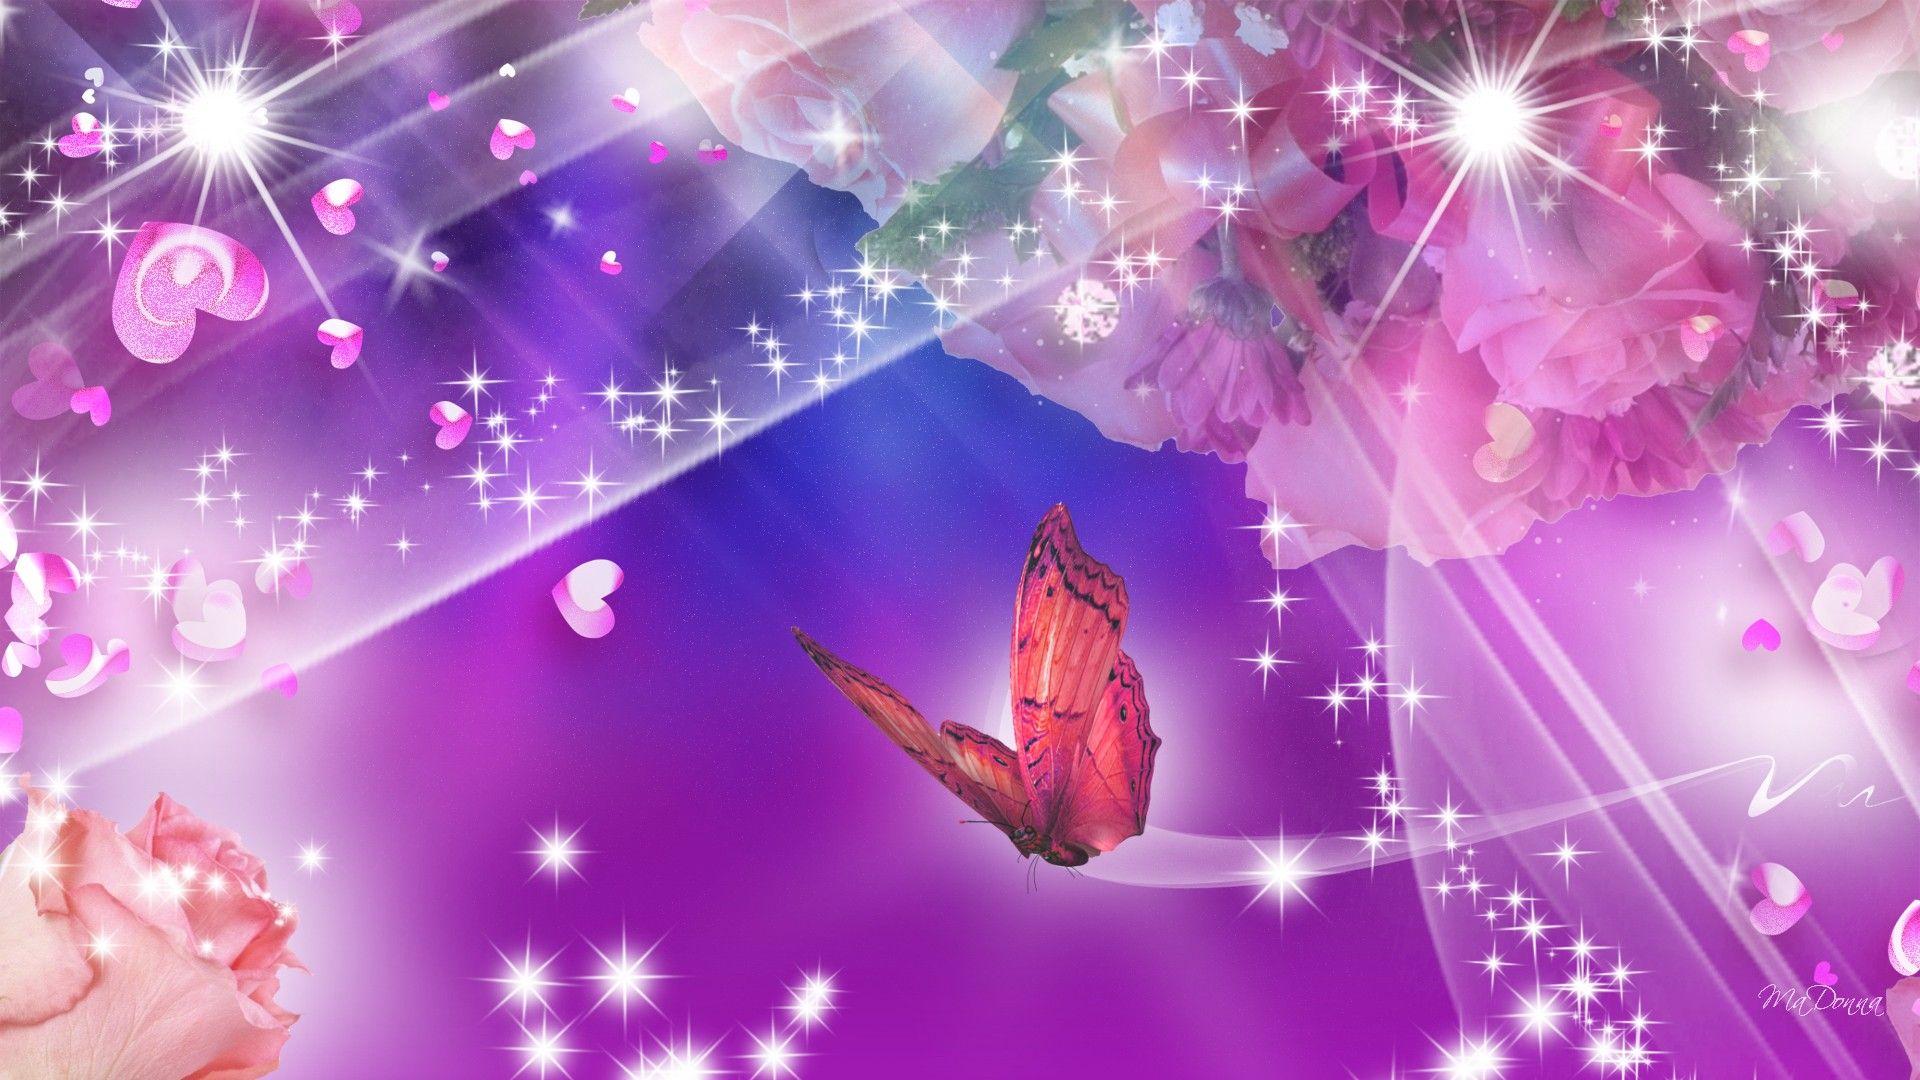 Wallpaper download free image search 3d - Hd Roses On Bright Wallpaper Download Free 73316